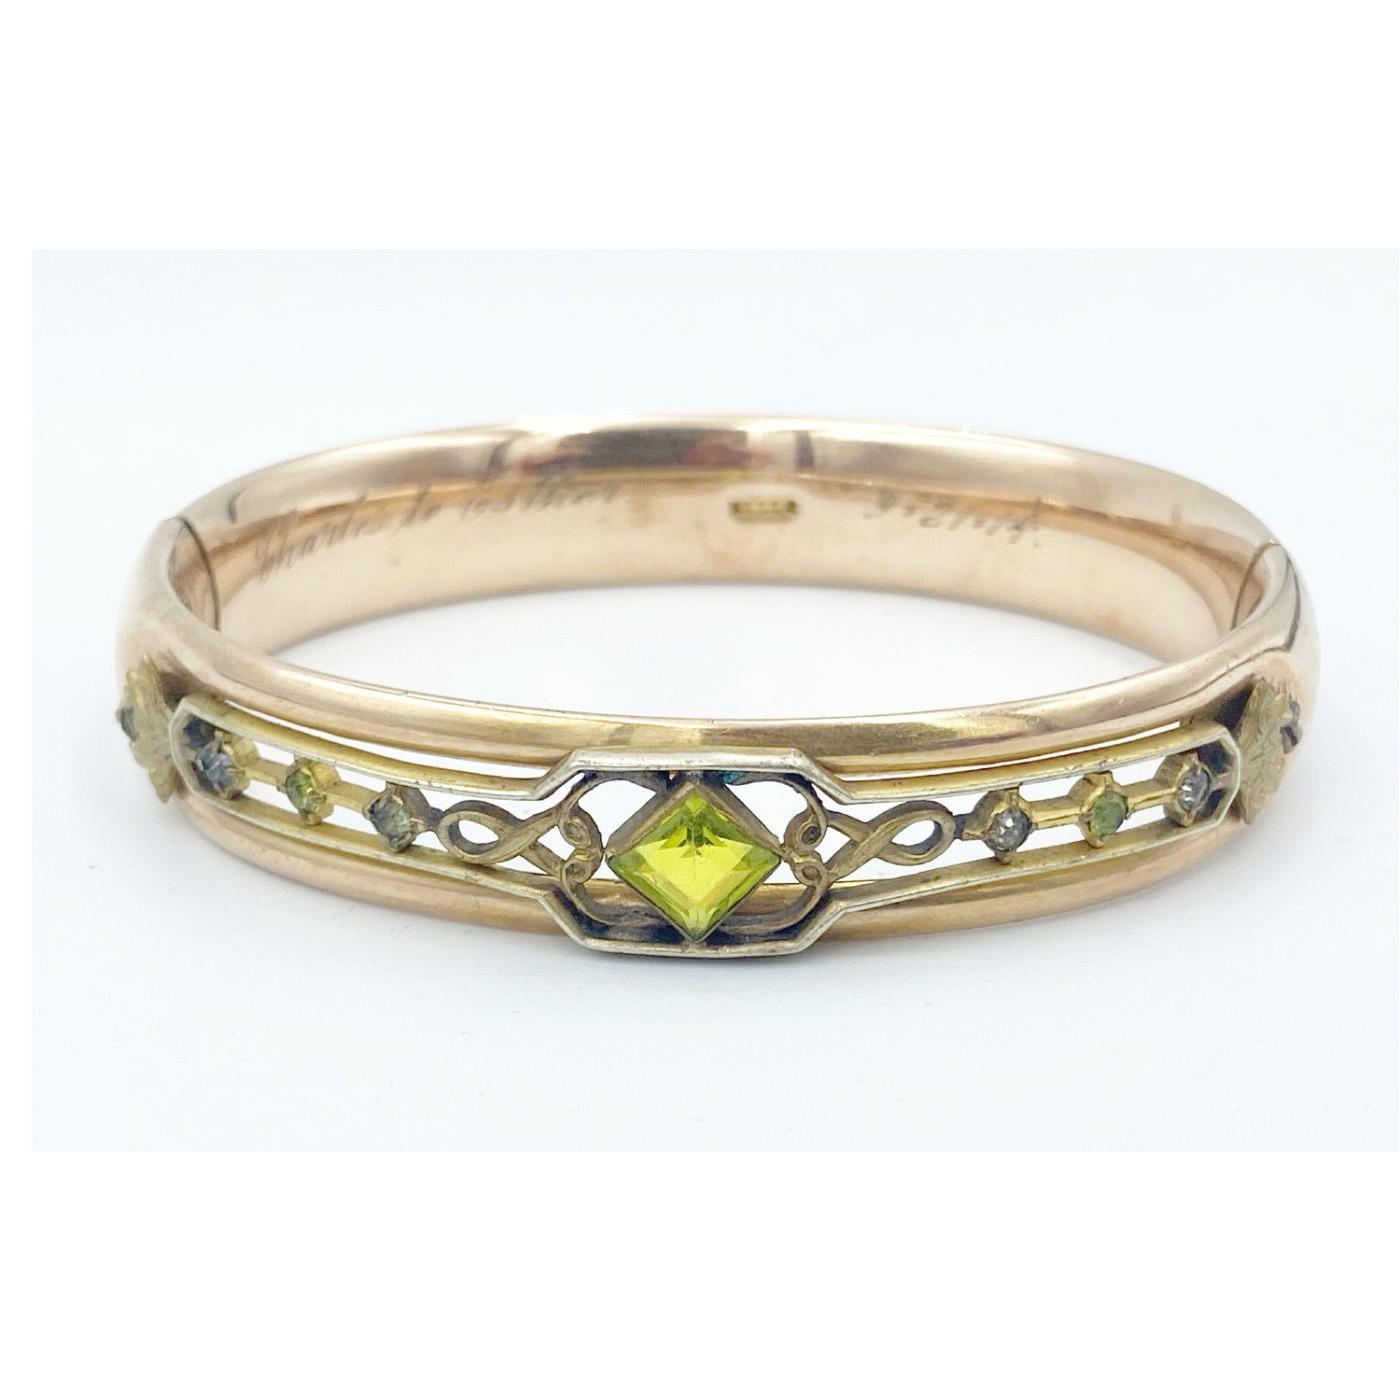 Unusual Lime Green Central Stone Engagement Bangle Bracelet